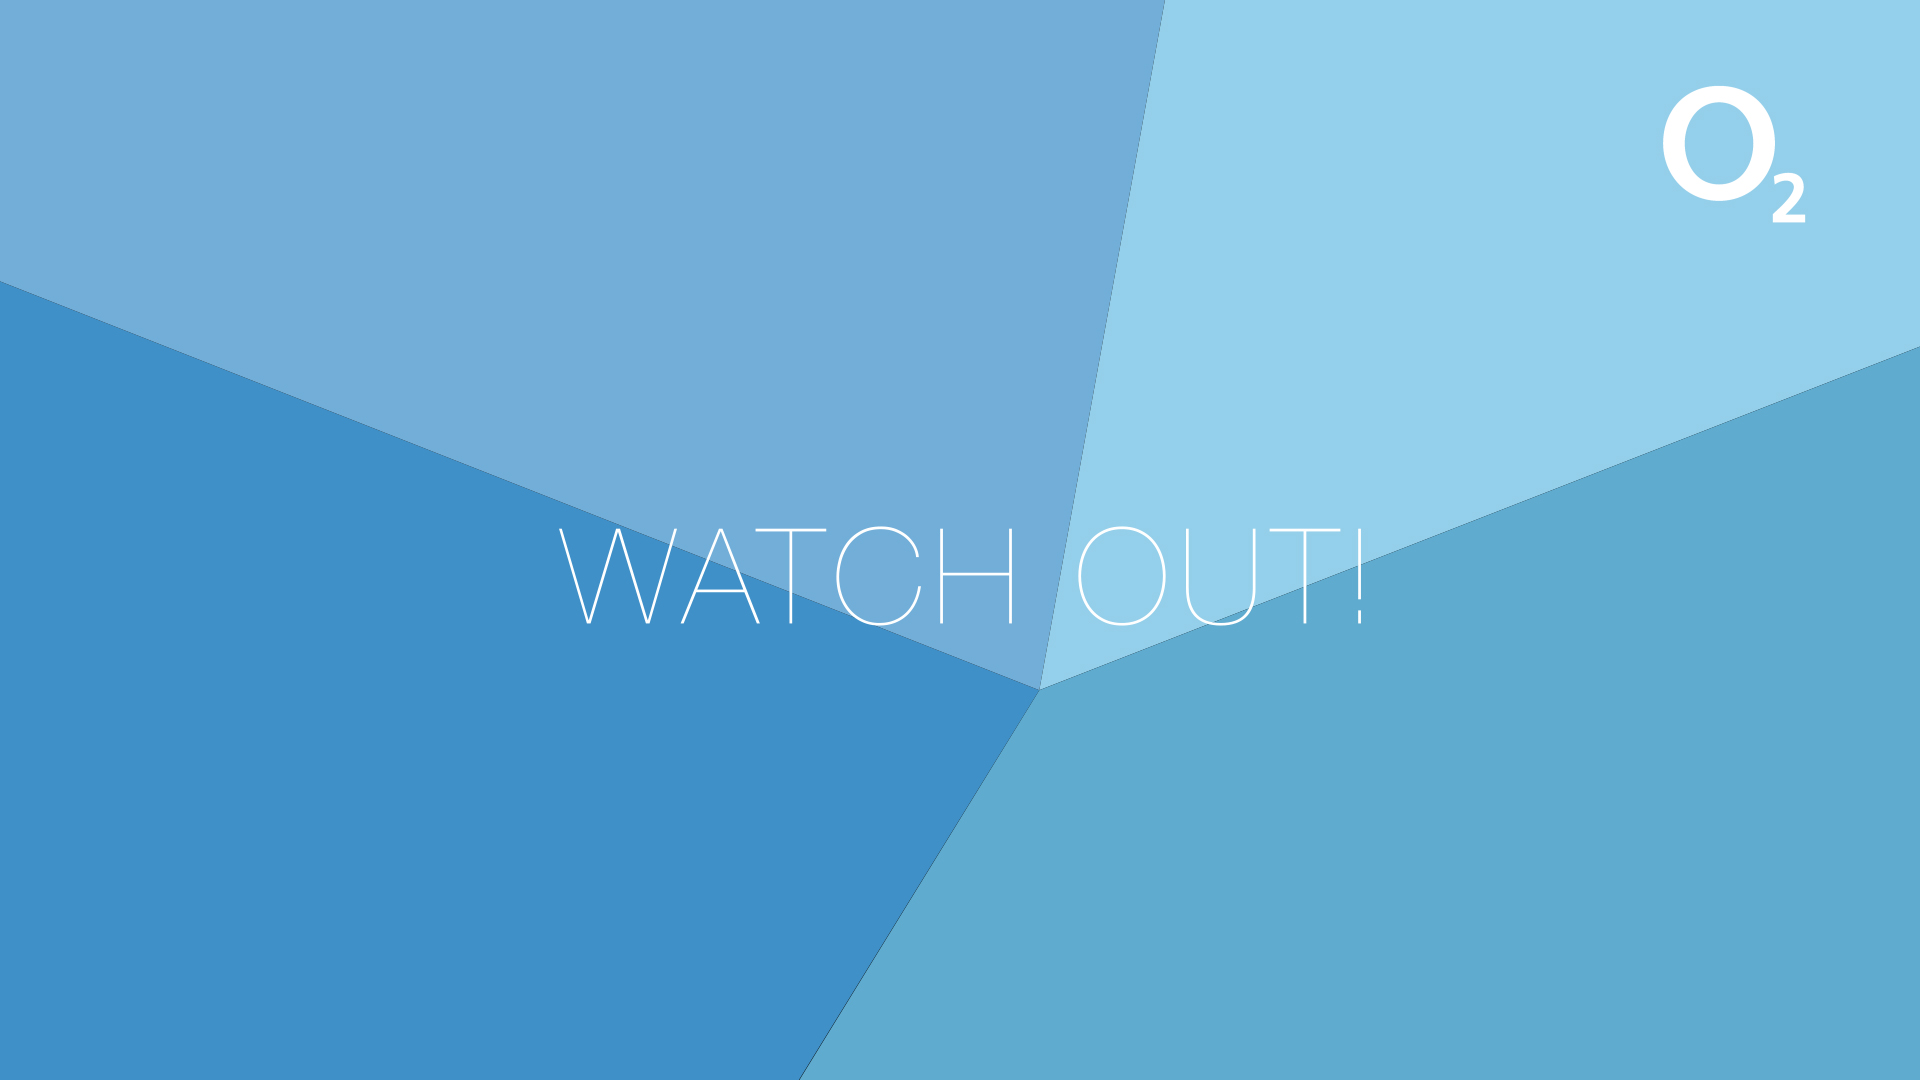 _watch_out_showreel_o2_Screen_14.jpg